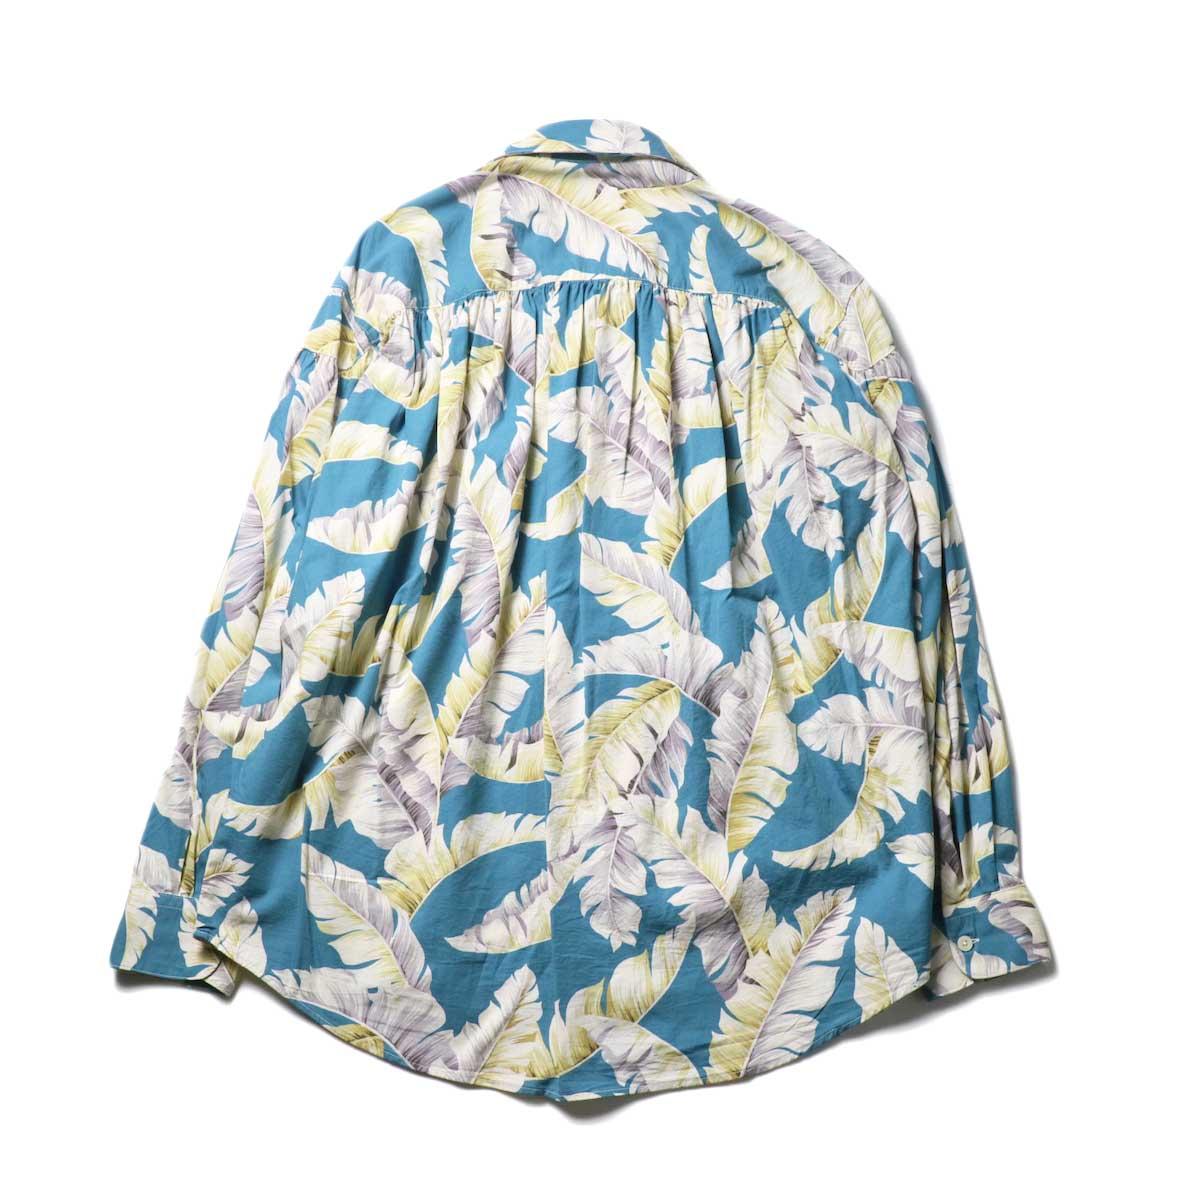 AiE / Painter Shirt - Hawaiian Print (Turquoise)背面